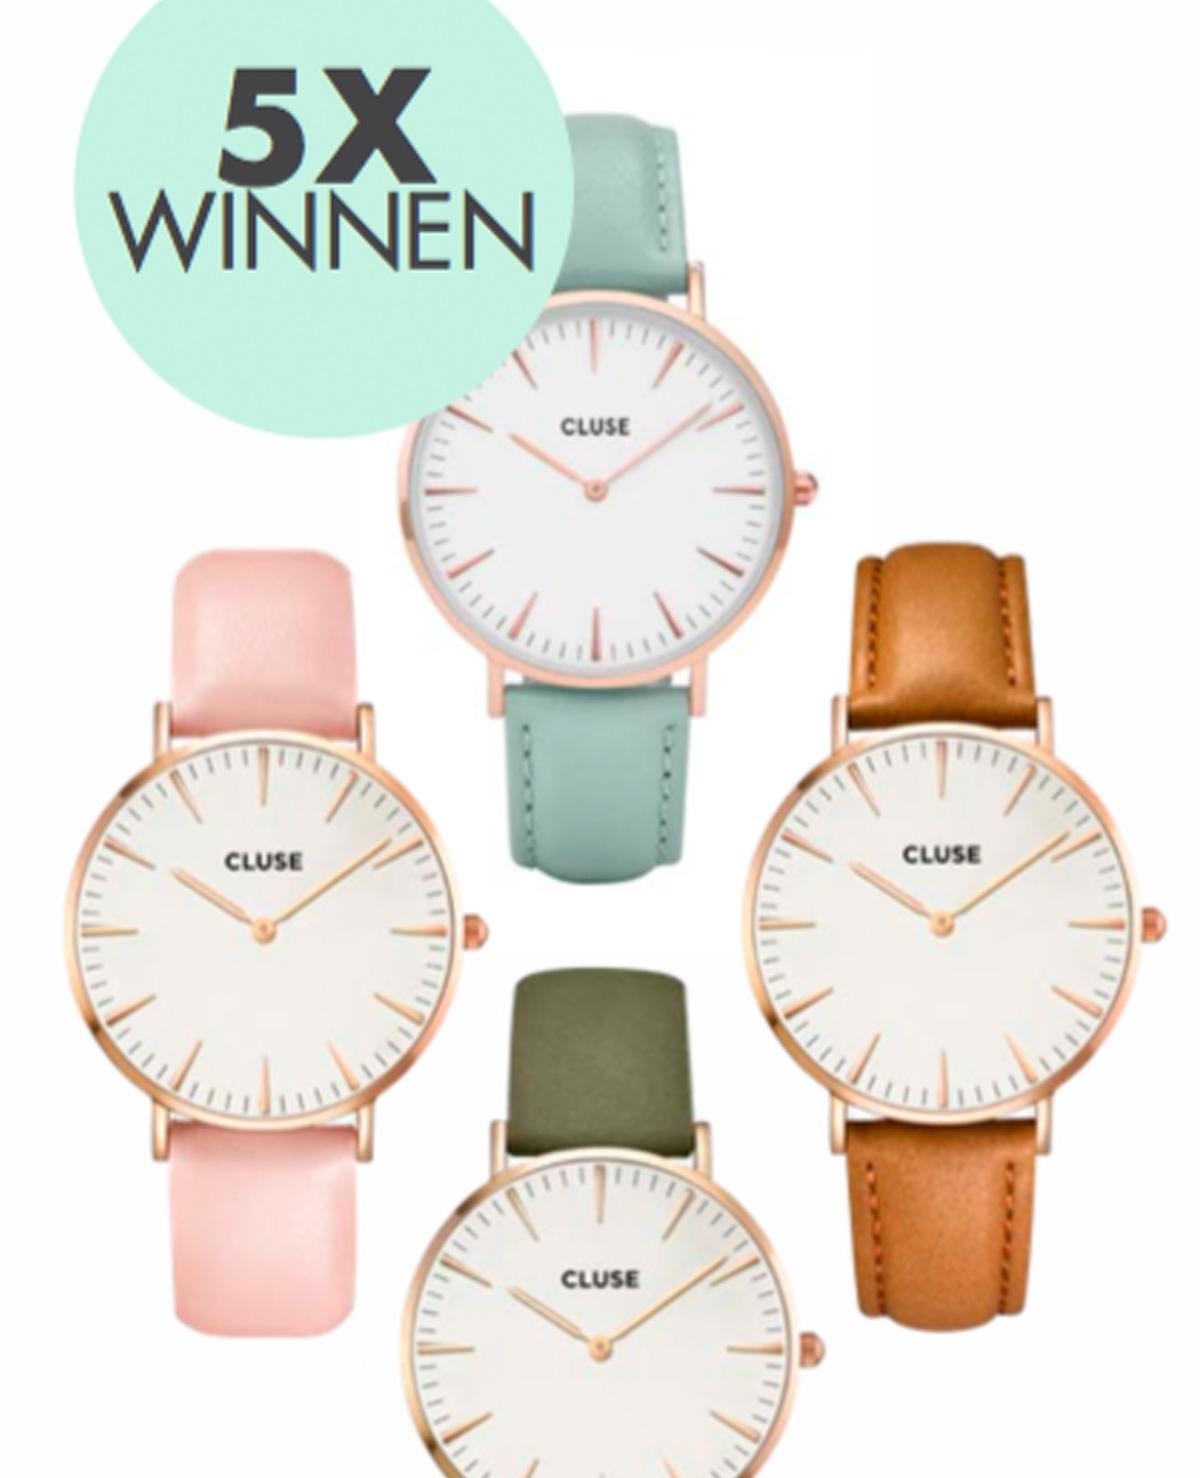 Winnen: 5x Cluse horloge t.w.v. € 89,95!